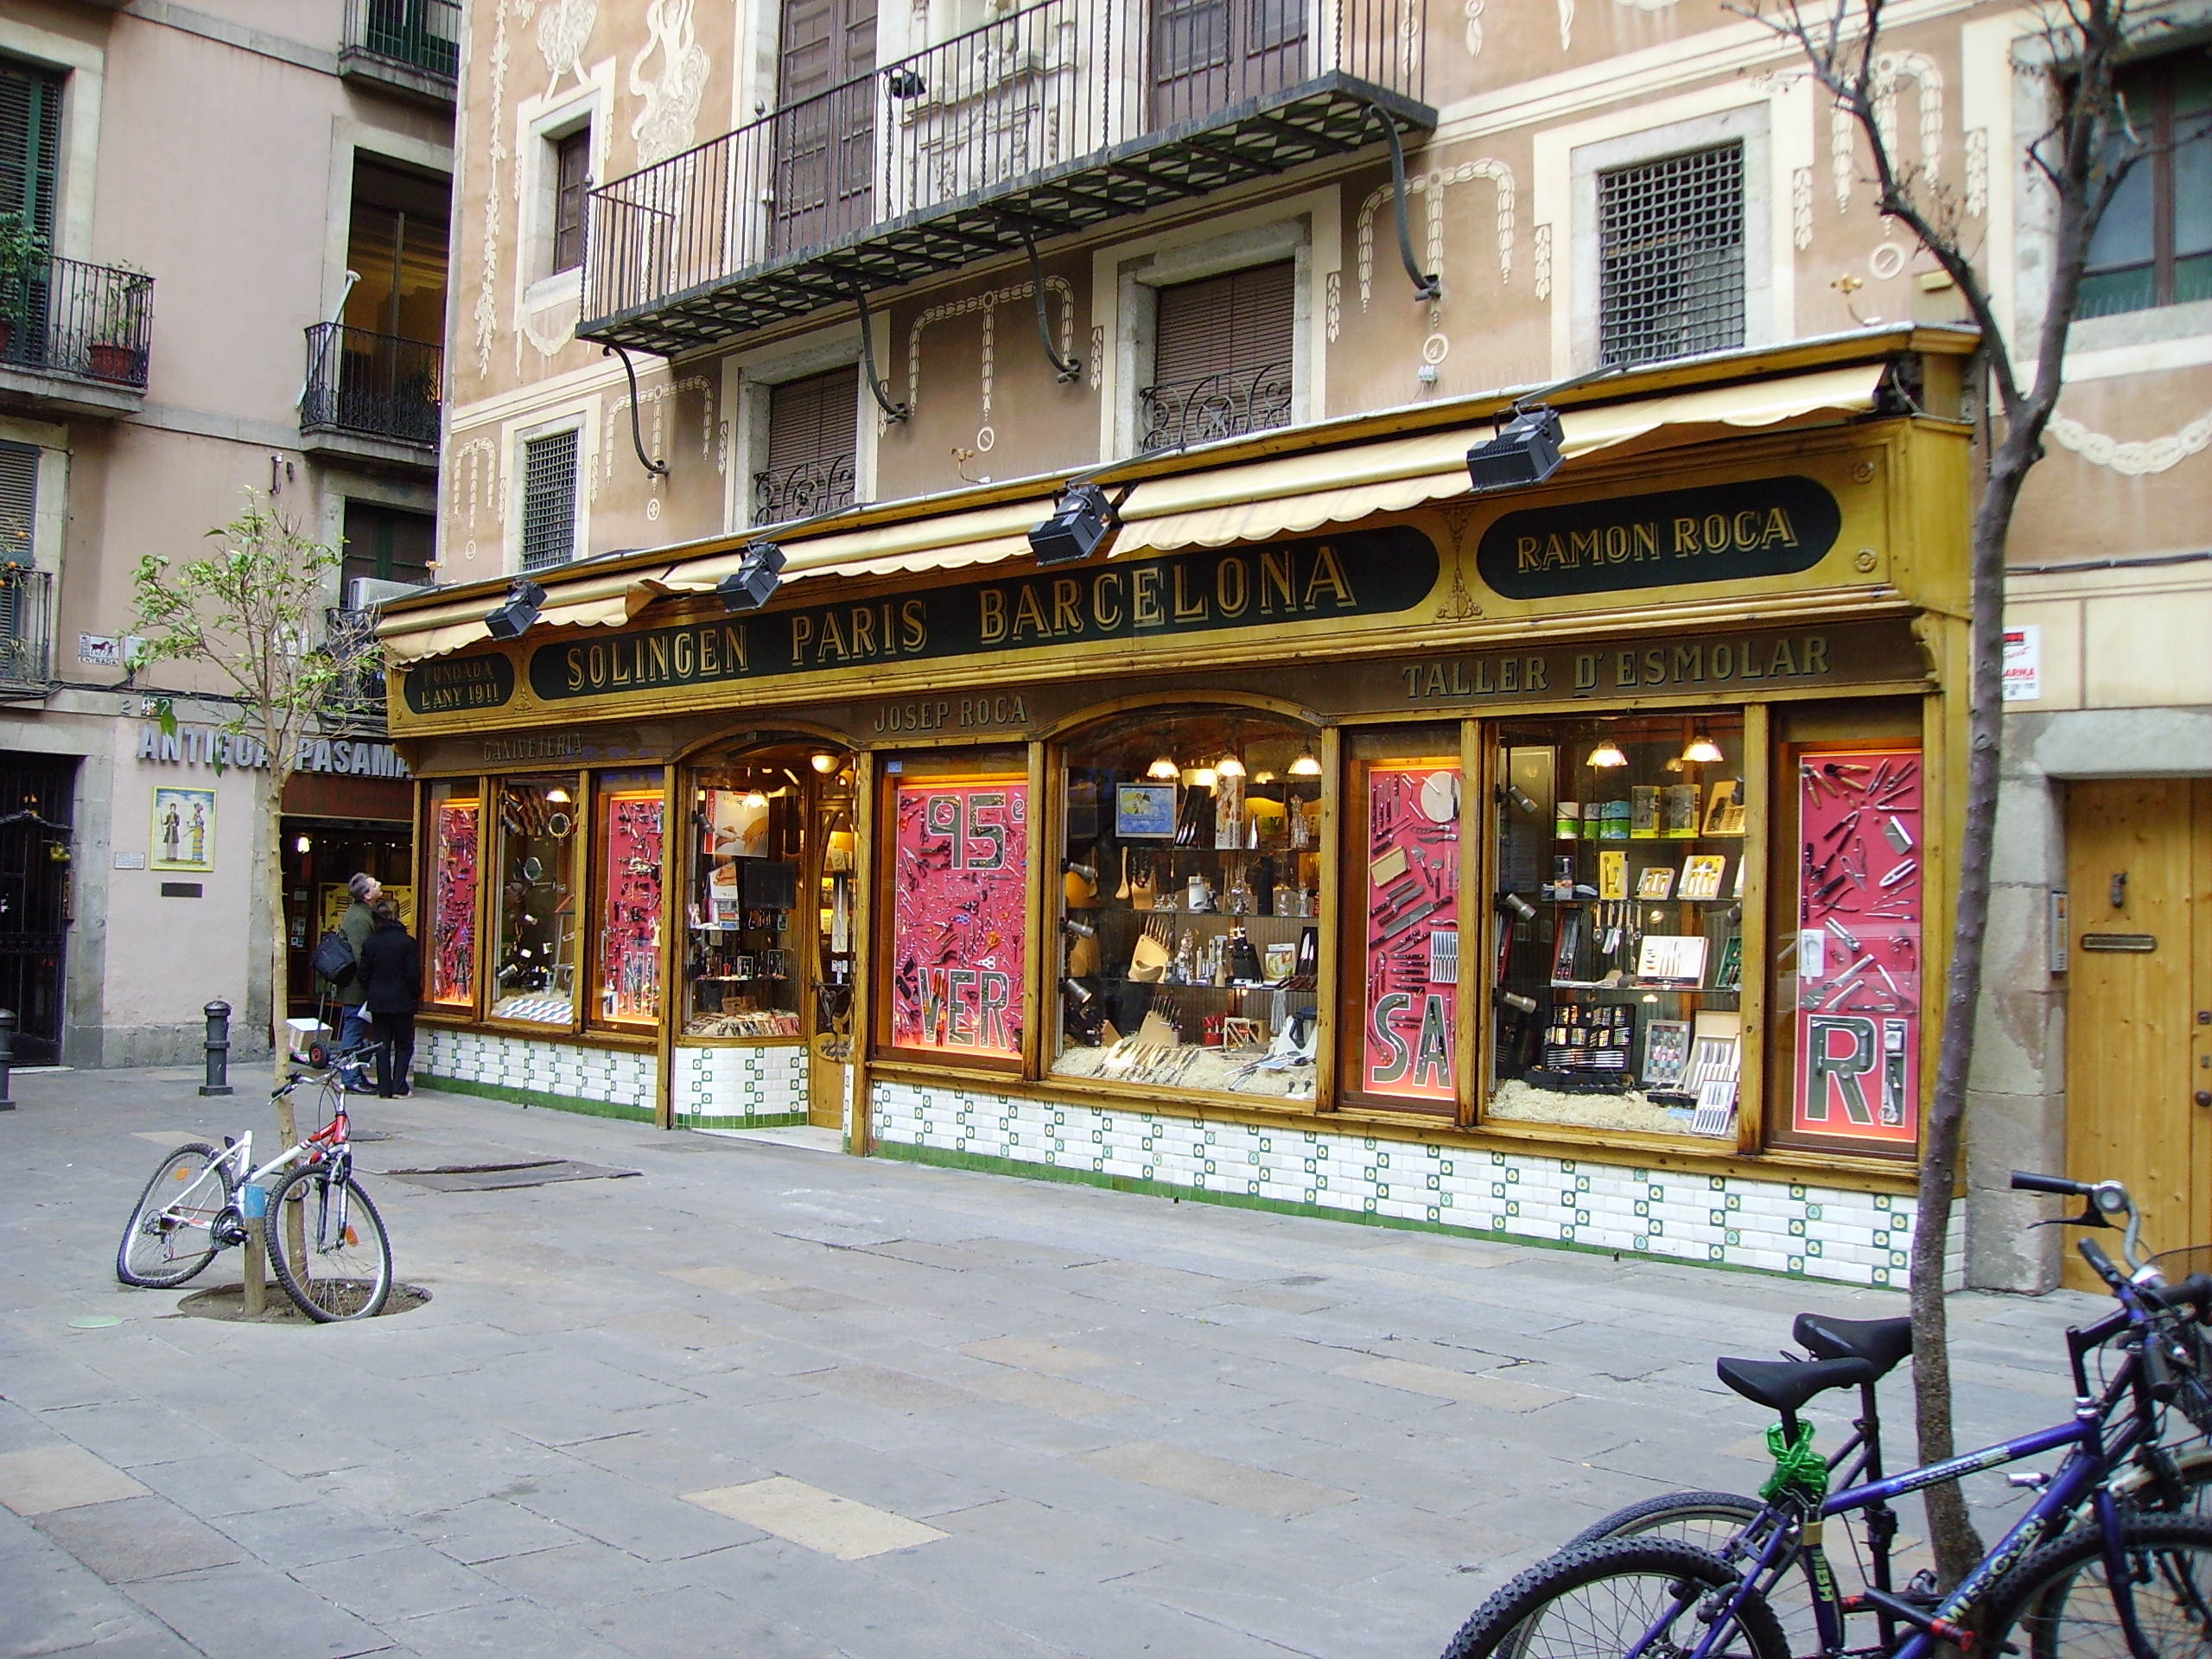 Roca barcelona restaurants roca moo y roca bar barcelona for Roca barcelona